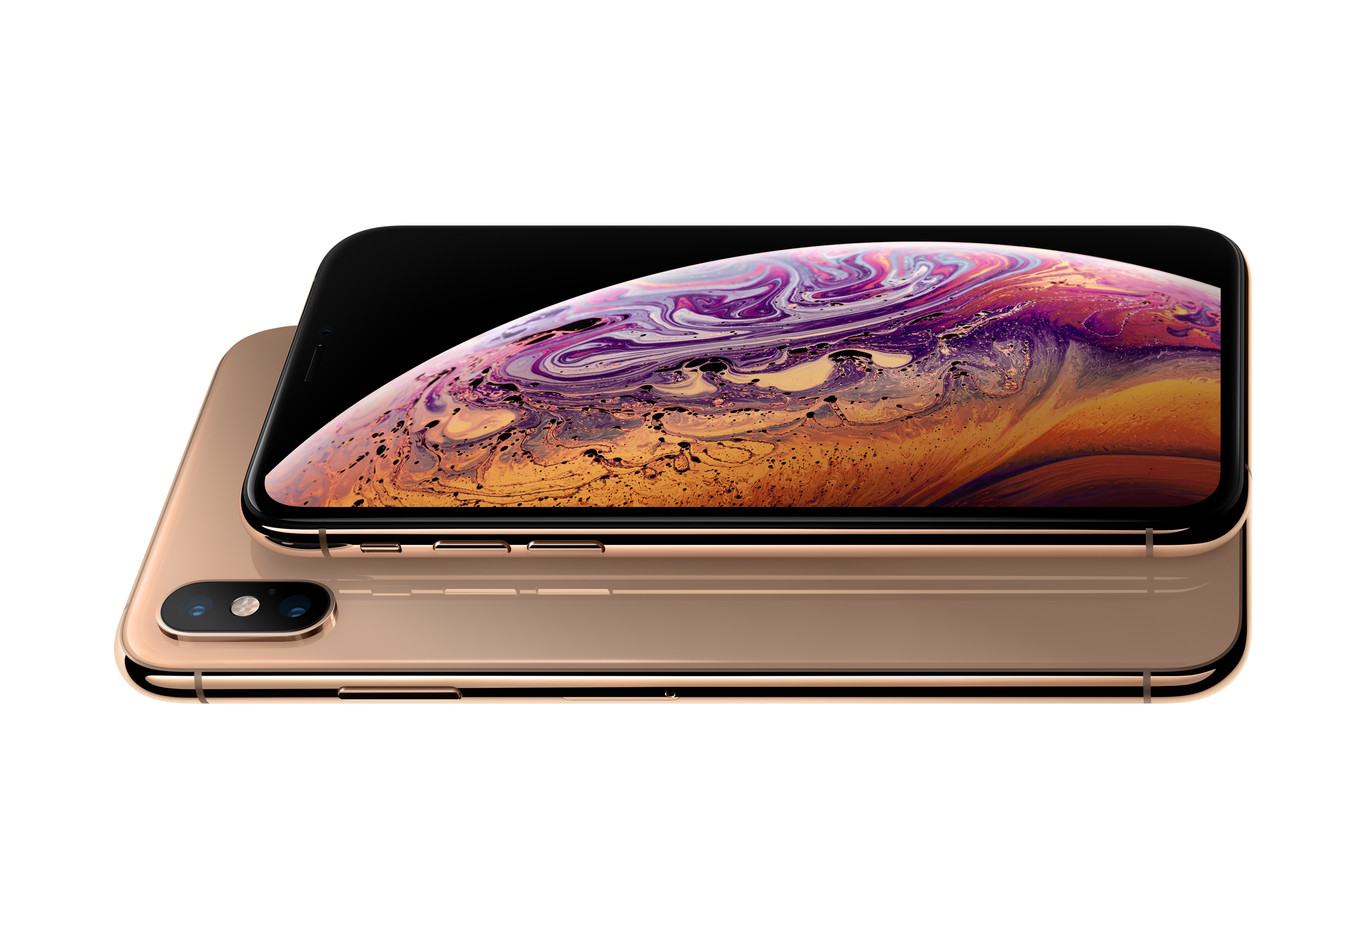 https://i.blogs.es/14e8c3/nuevos-iphone-xs-y-iphone-xs-max/1366_2000.jpg